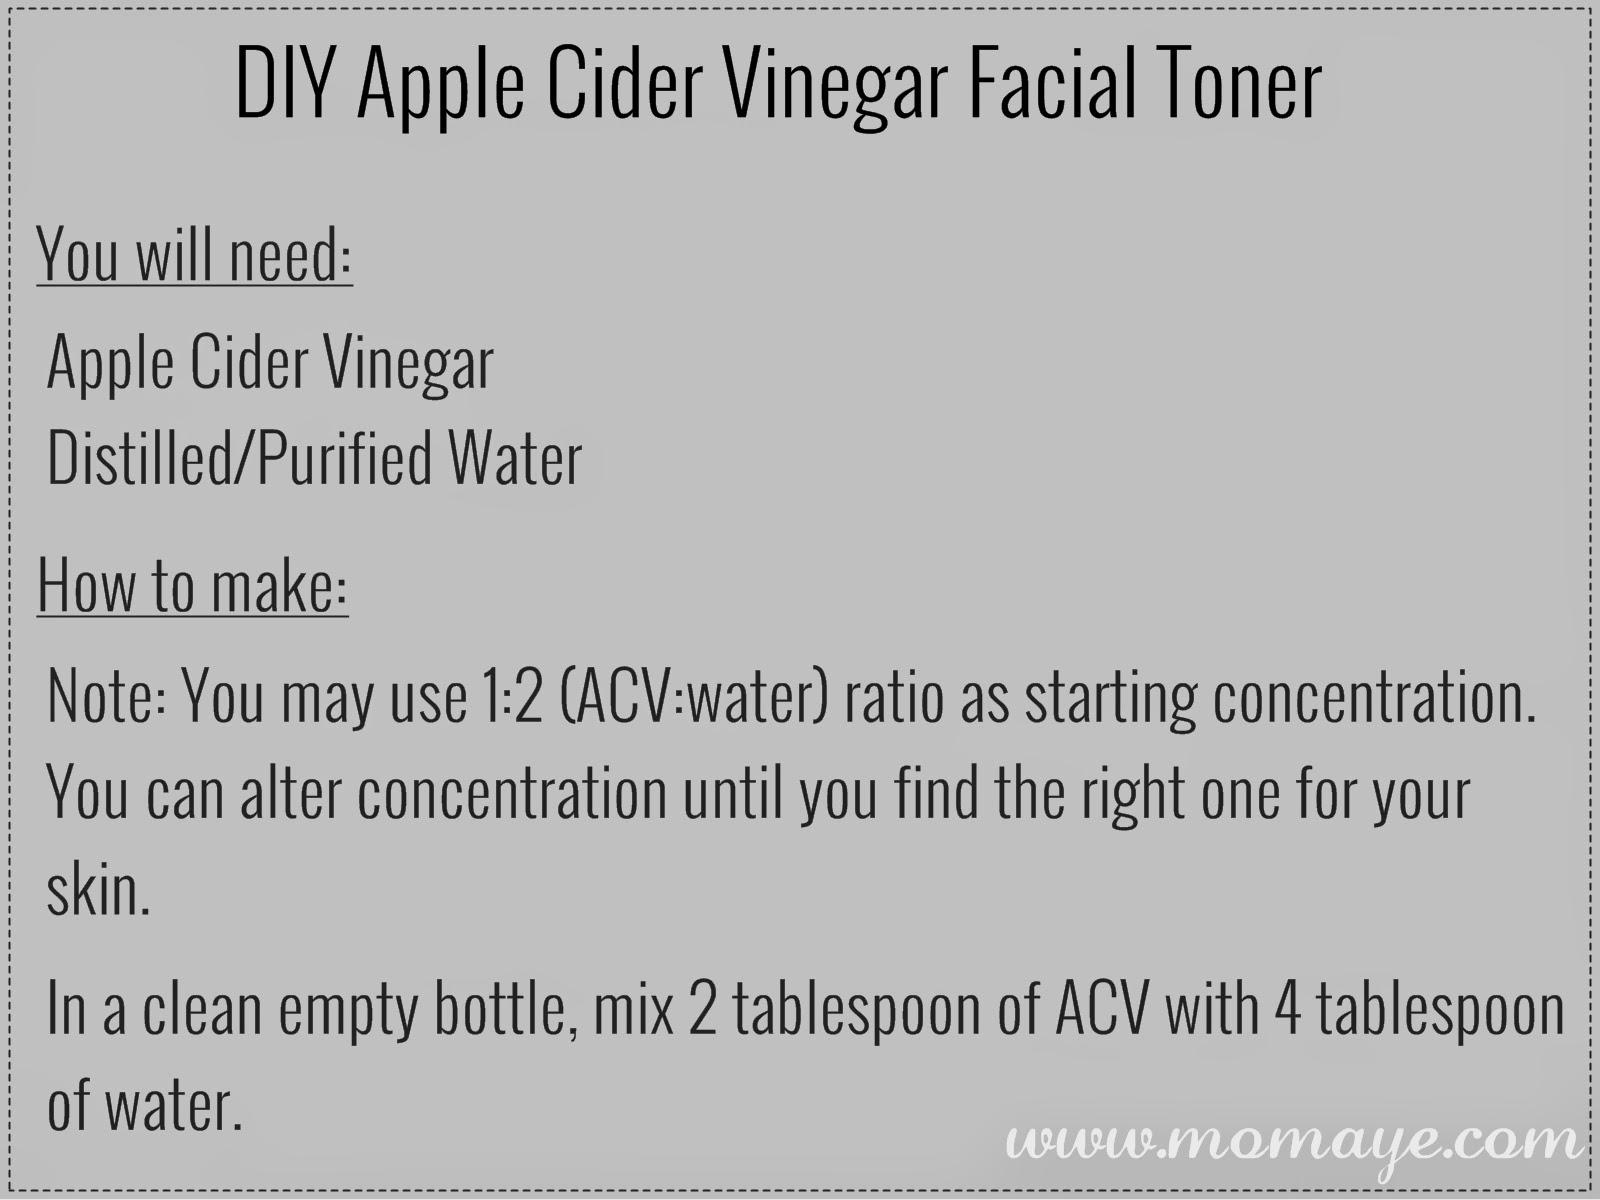 Apple cider vinegar as natural facial toner solutioingenieria Image collections